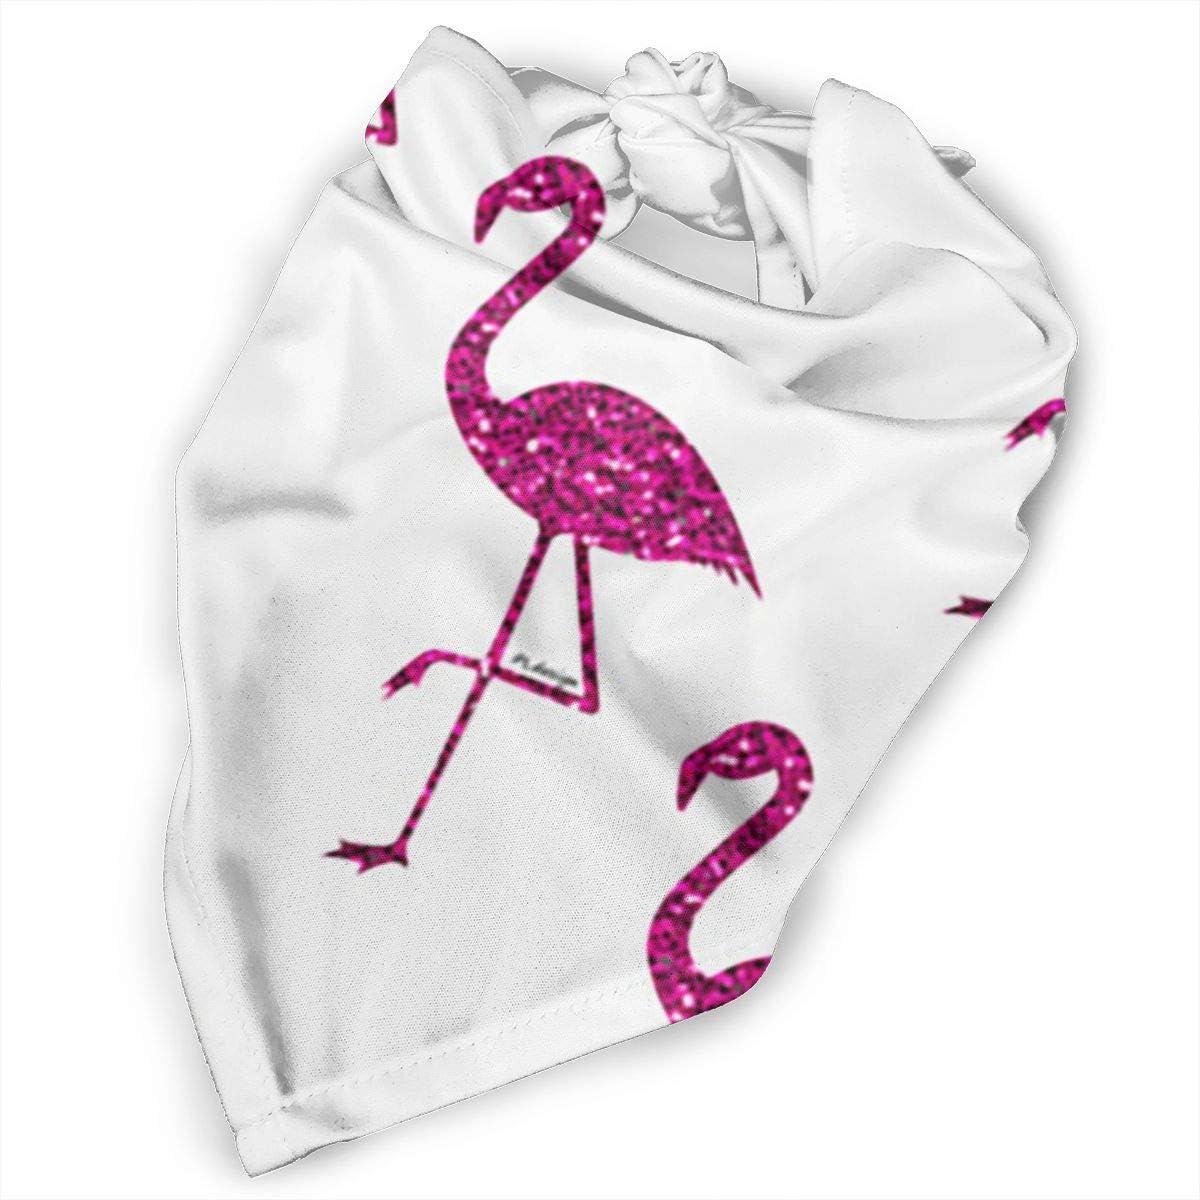 Pet Bandana Collar Bandana Preppy Pet Scarf Flamingo Pet Scarf Dog Scarf Girly Dog Bandana Pet Accessories